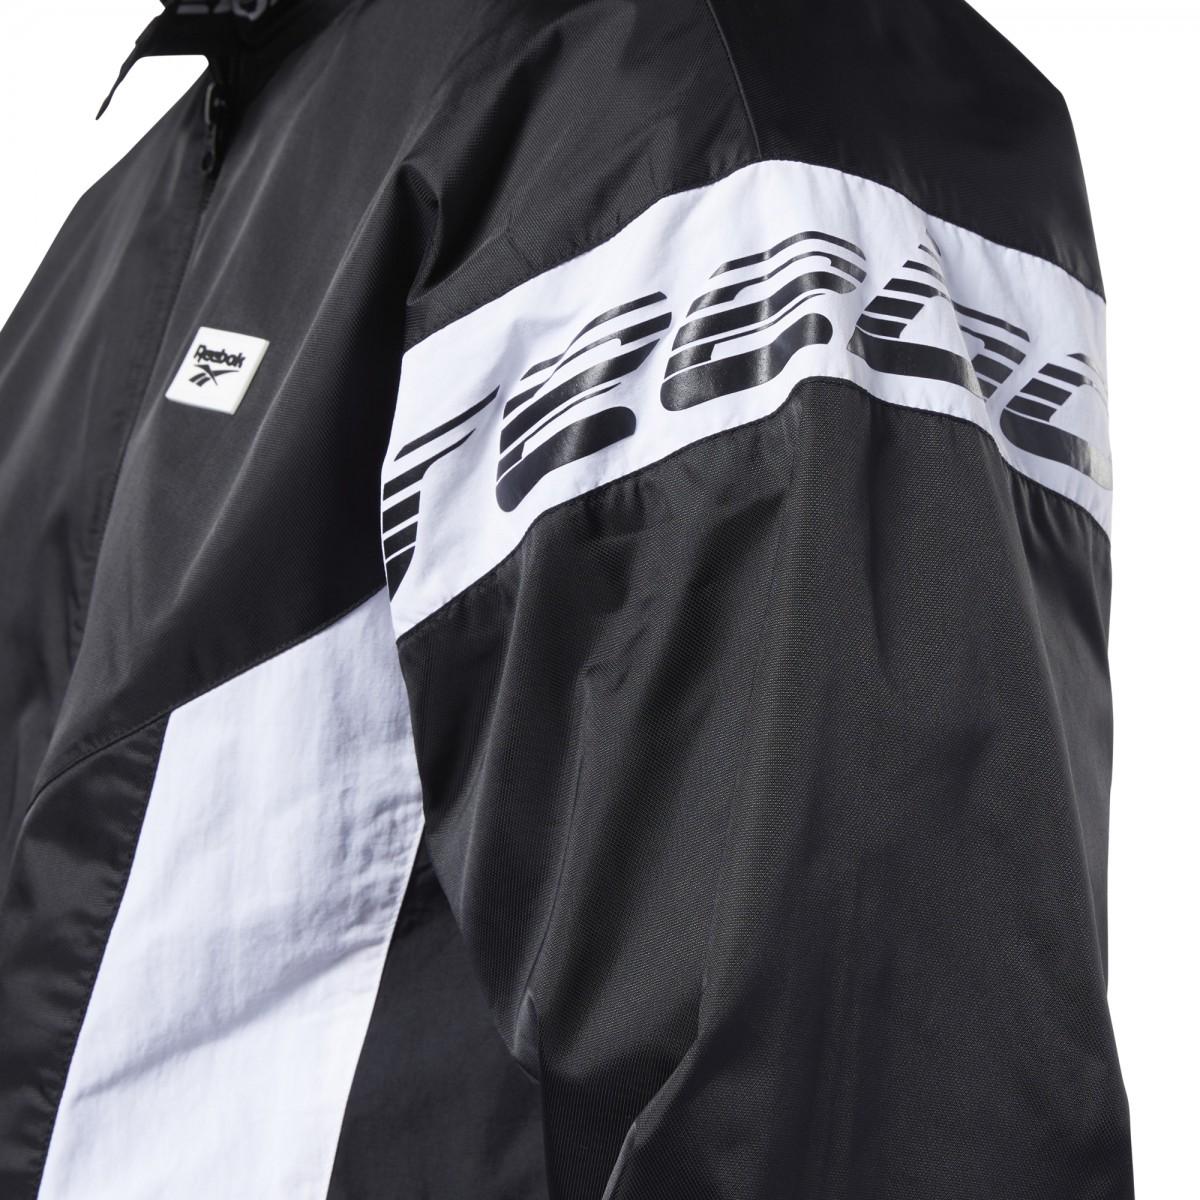 Reebok Classic Advance Track Jacket